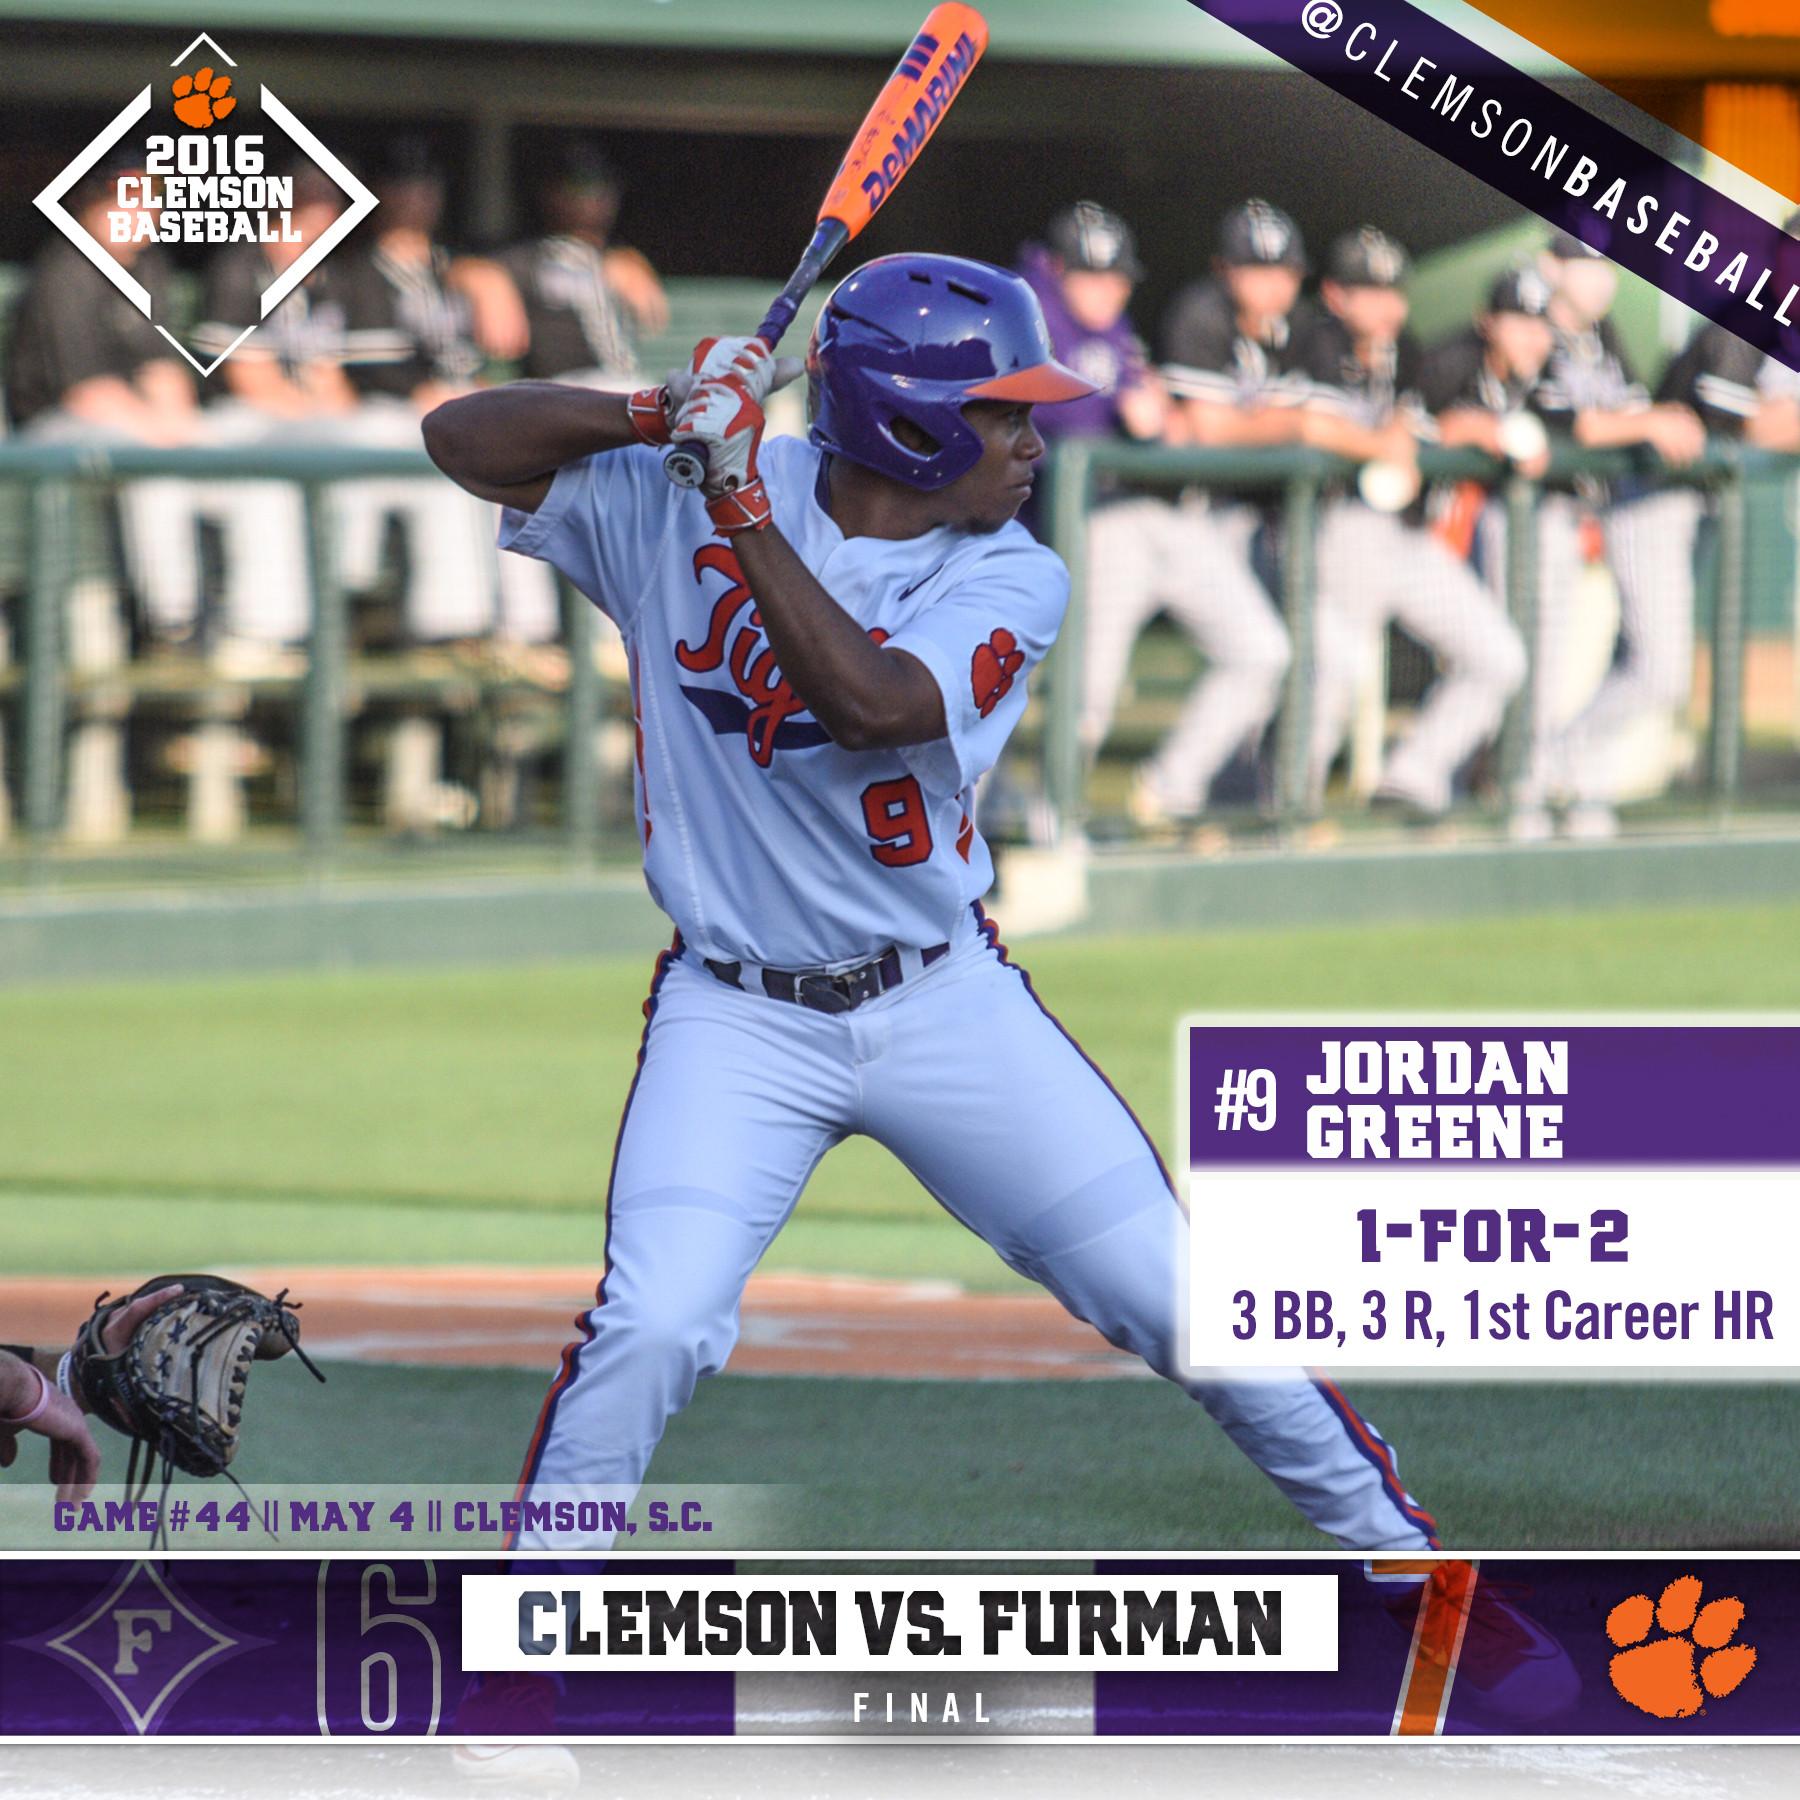 Clemson Edges Furman 7-6 In 11